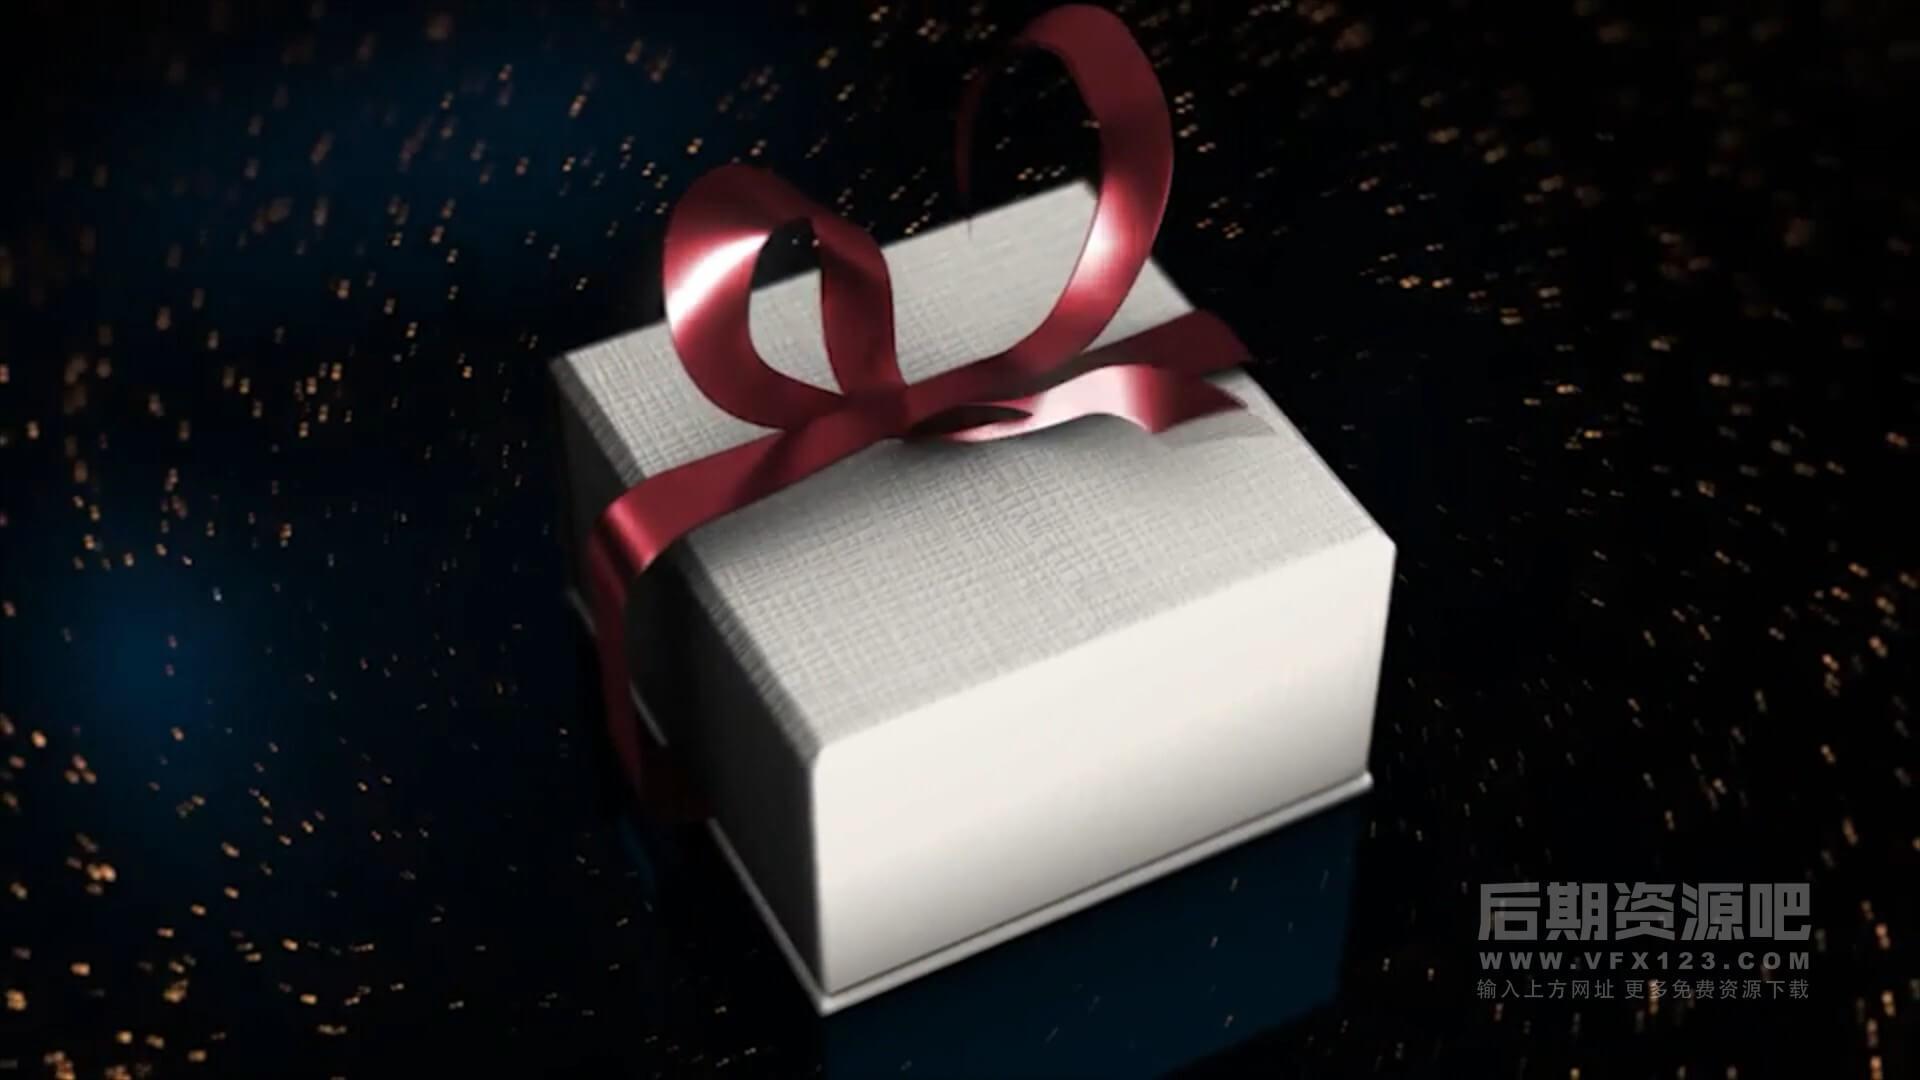 Motion模板 浪漫婚礼情人节片头开场 The Best Gift